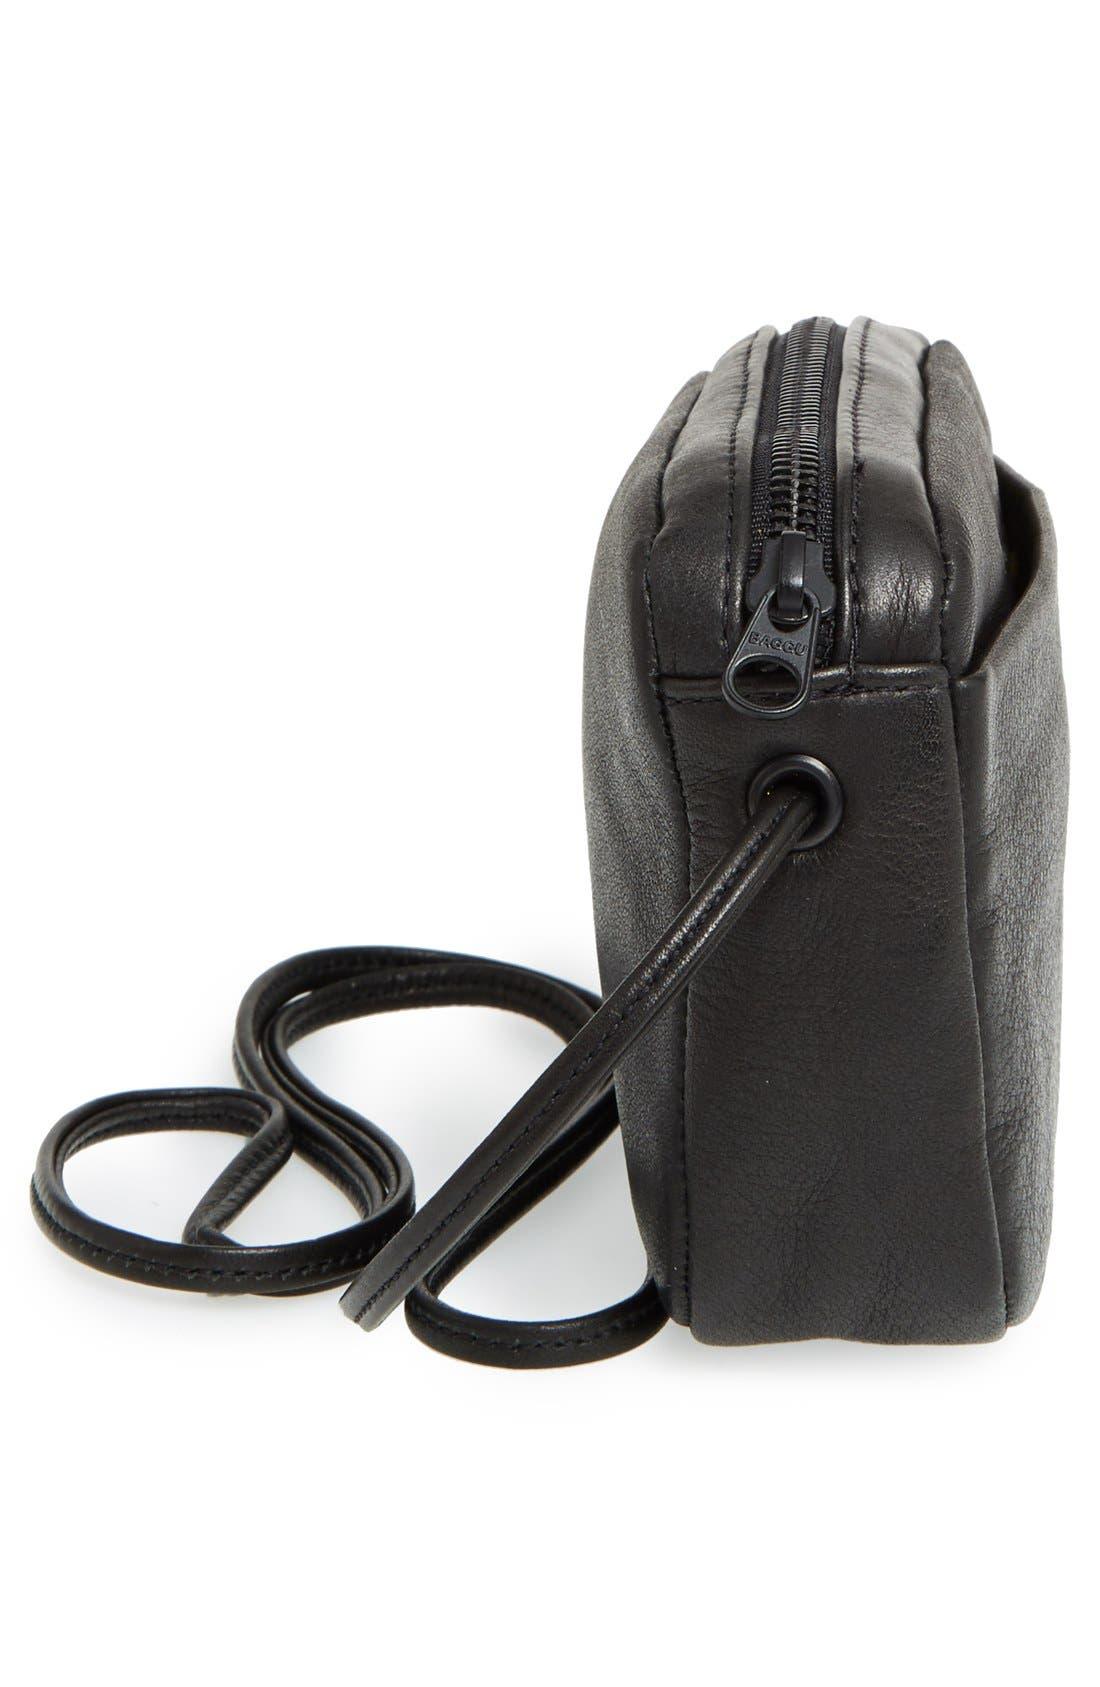 'Mini' Pebbled Leather Crossbody,                             Alternate thumbnail 10, color,                             005